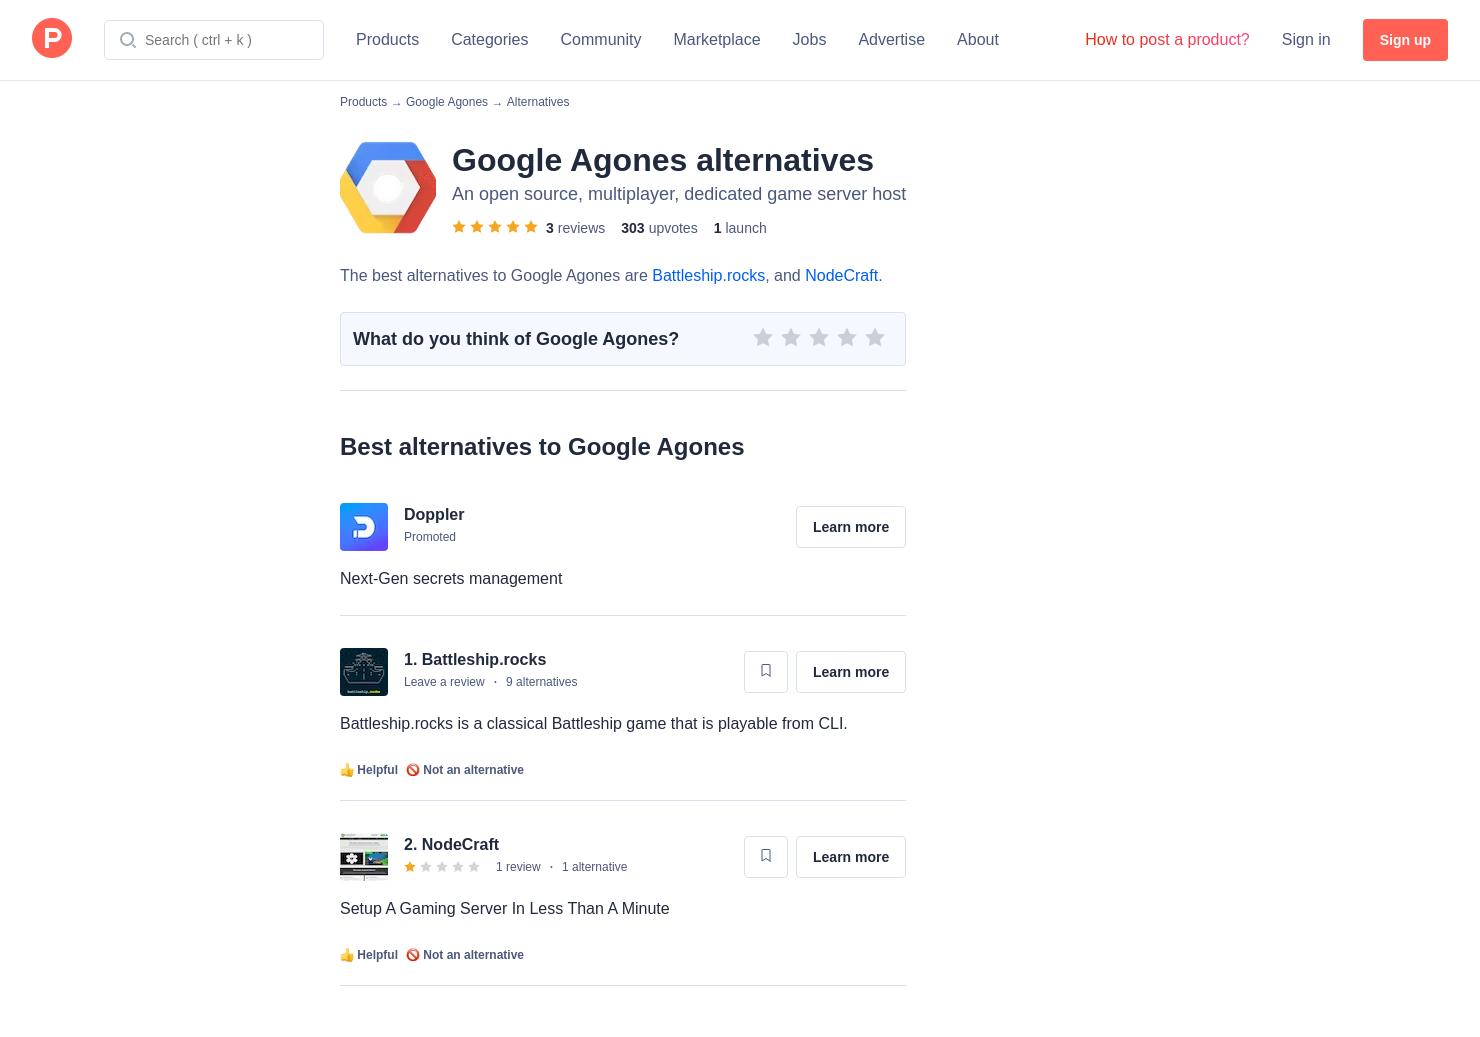 5 Alternatives to Google Agones | Product Hunt